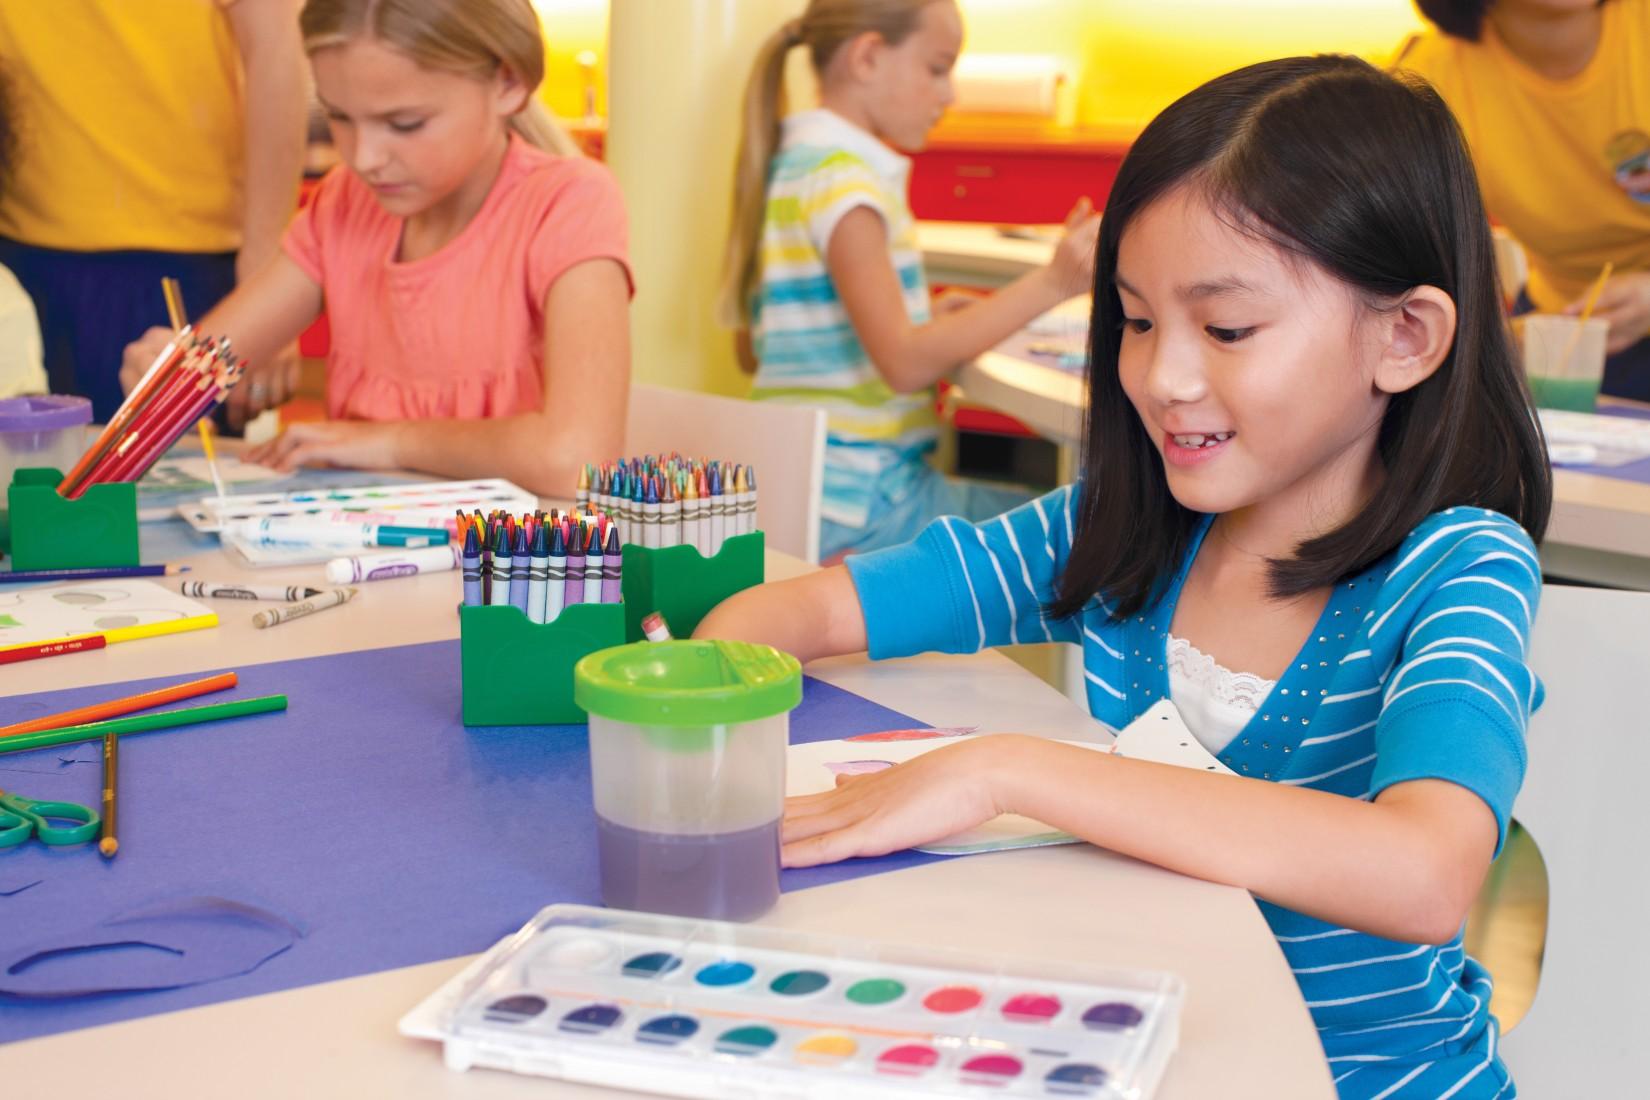 royal-caribbean-kids-education-activities